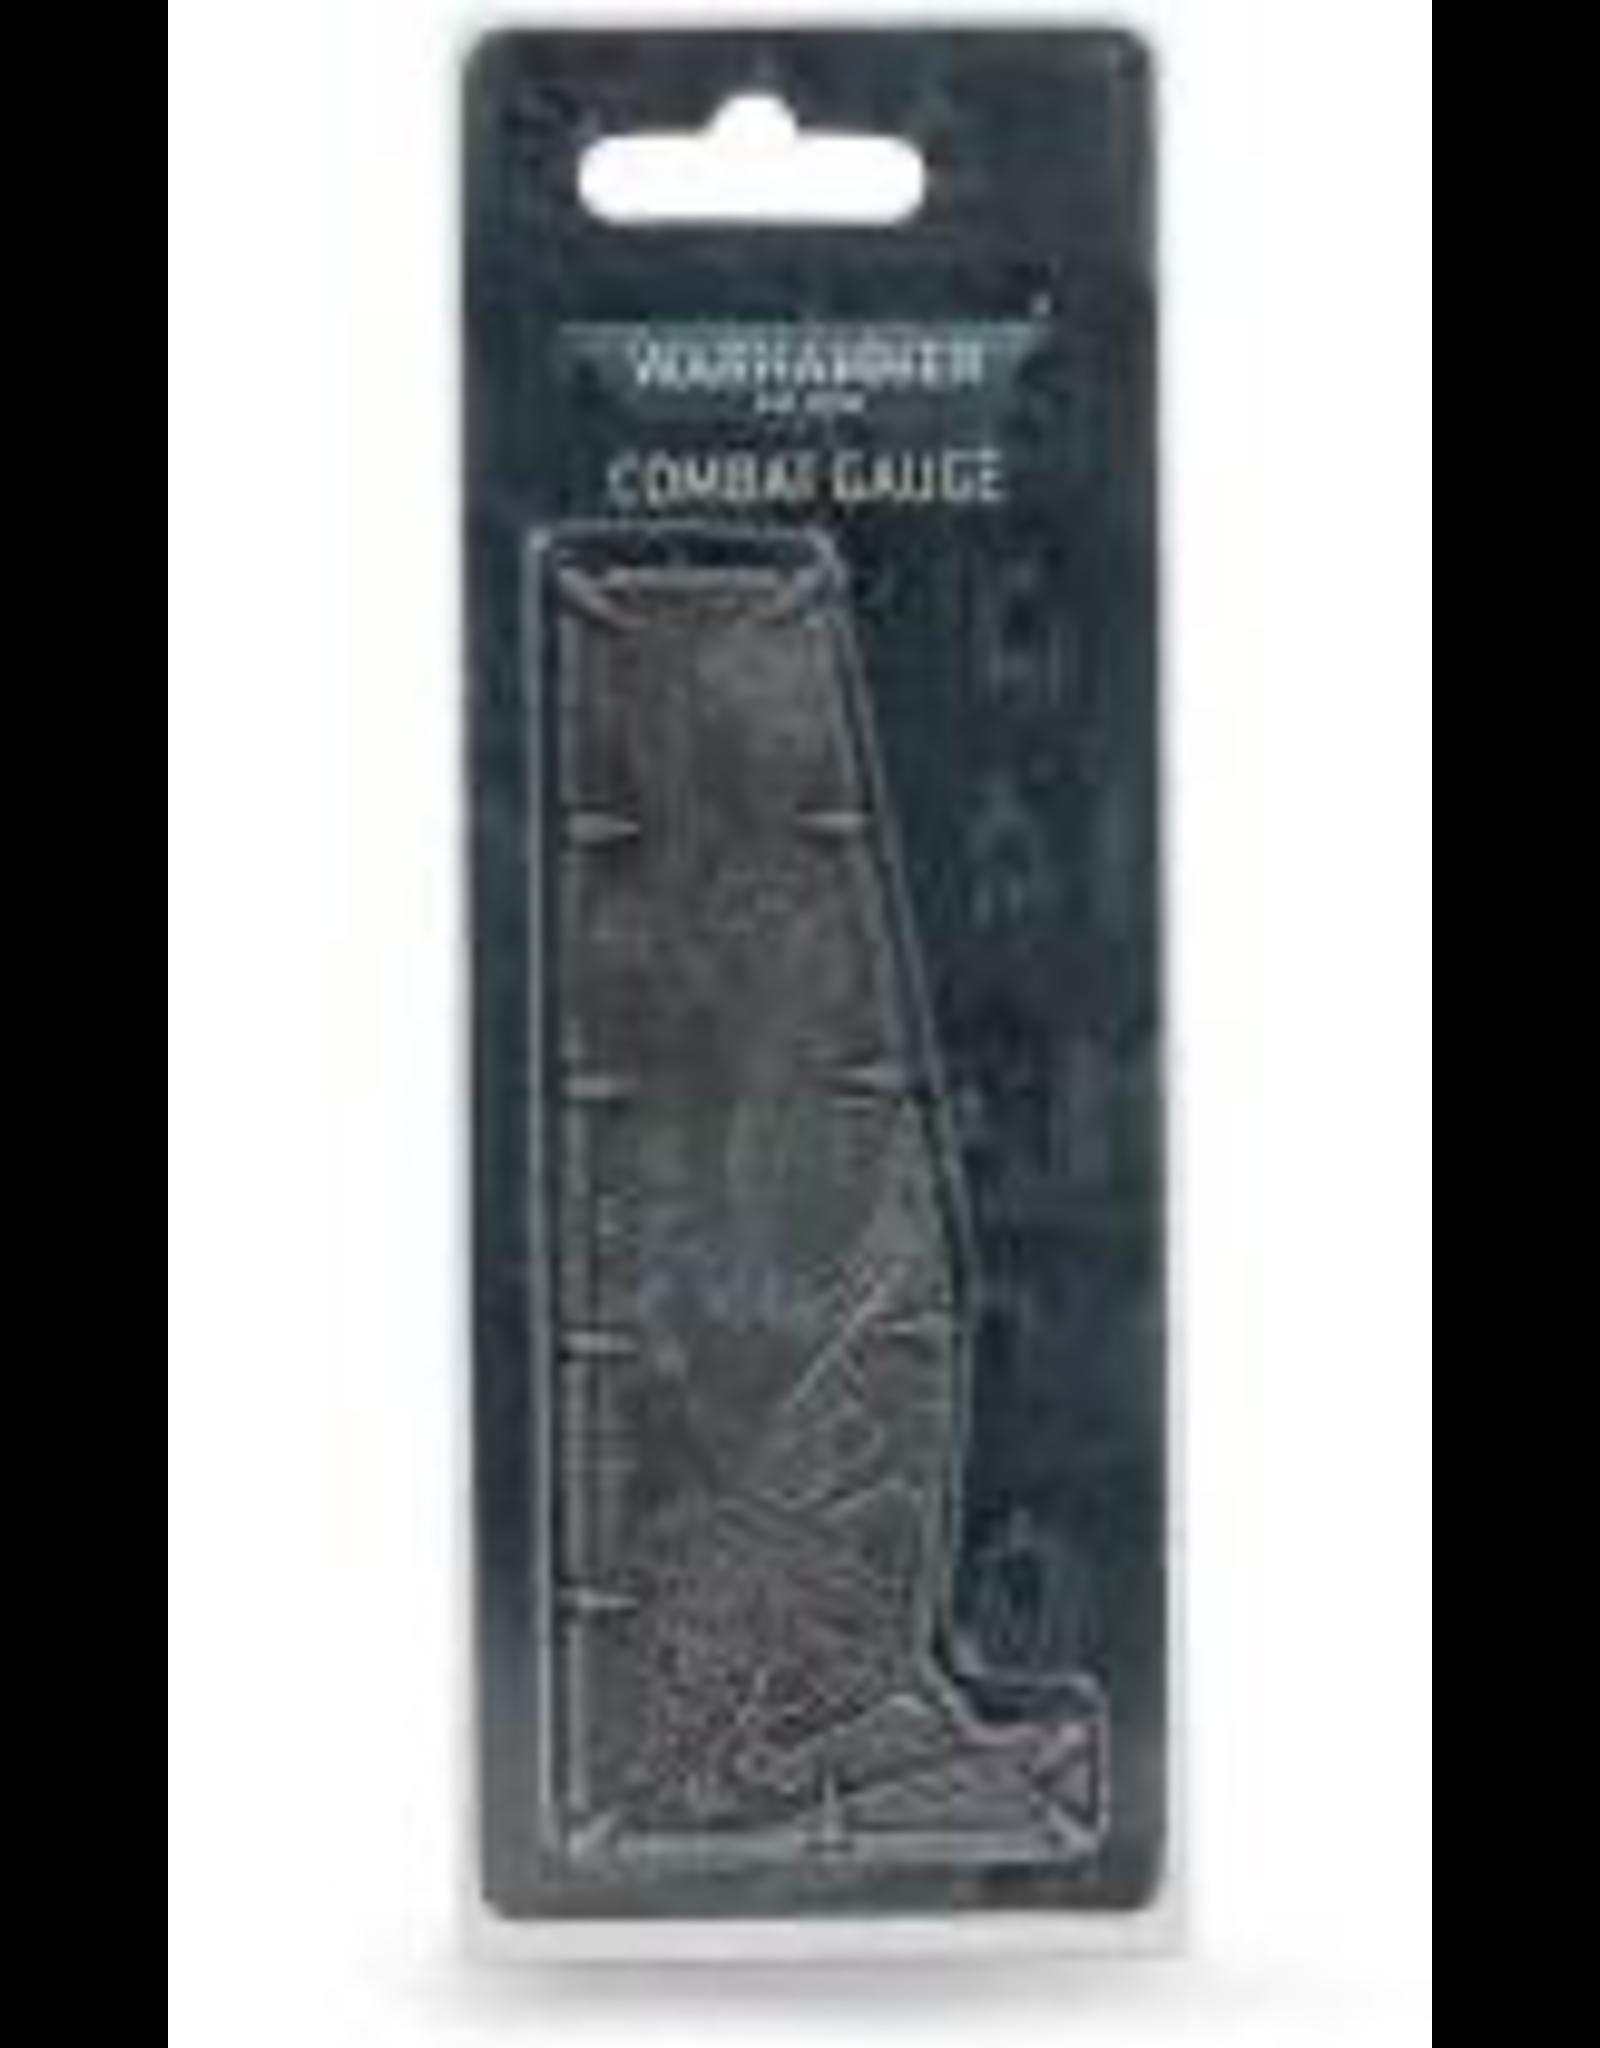 Games Workshop WARHAMMER 40000 COMBAT GAUGE